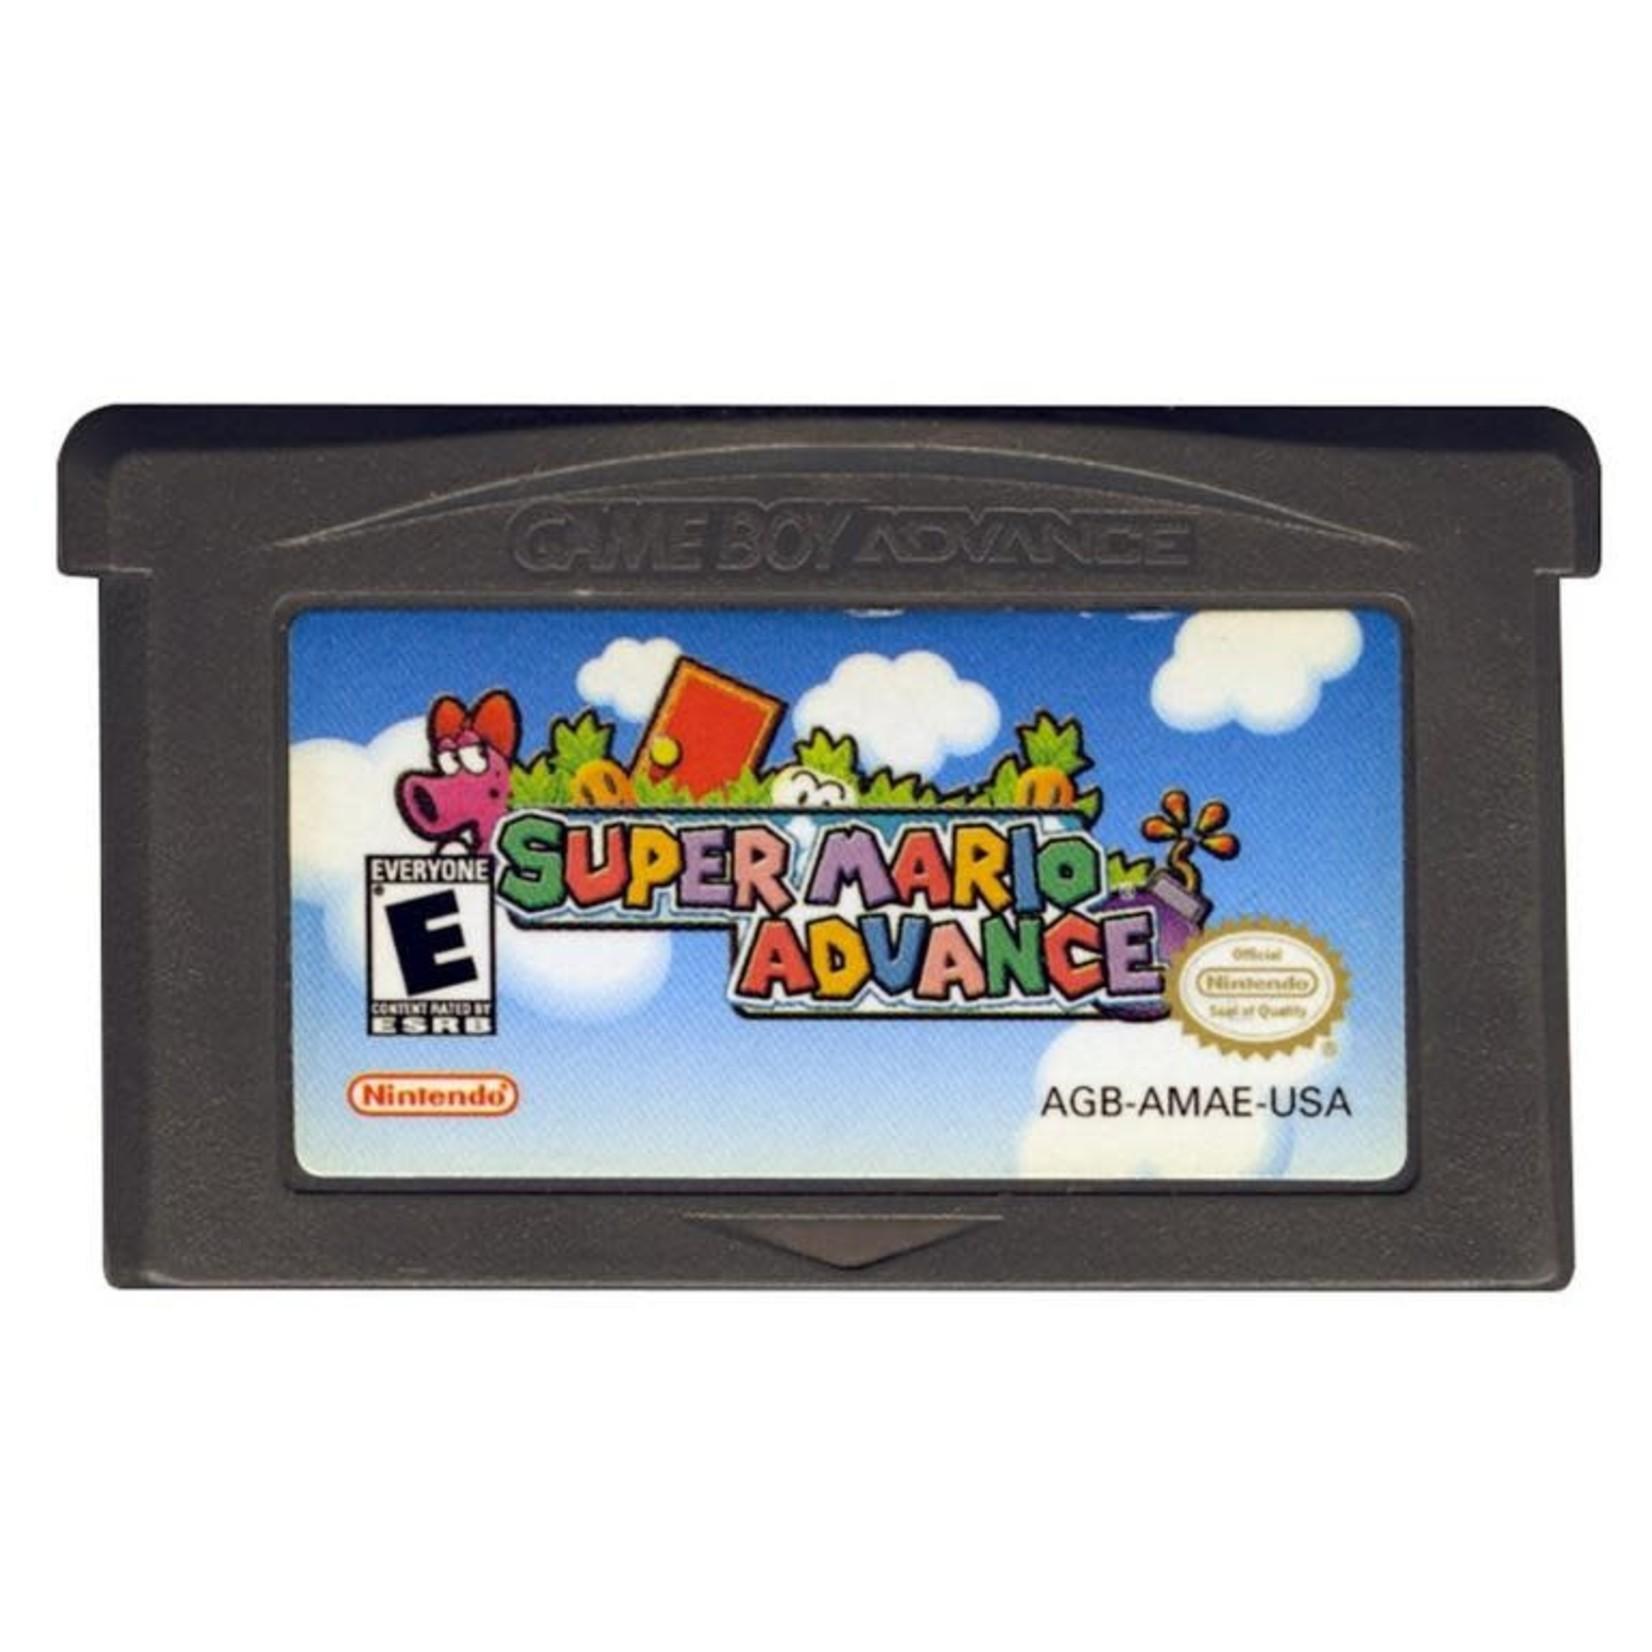 gbau-Super Mario Advance (carteidge)